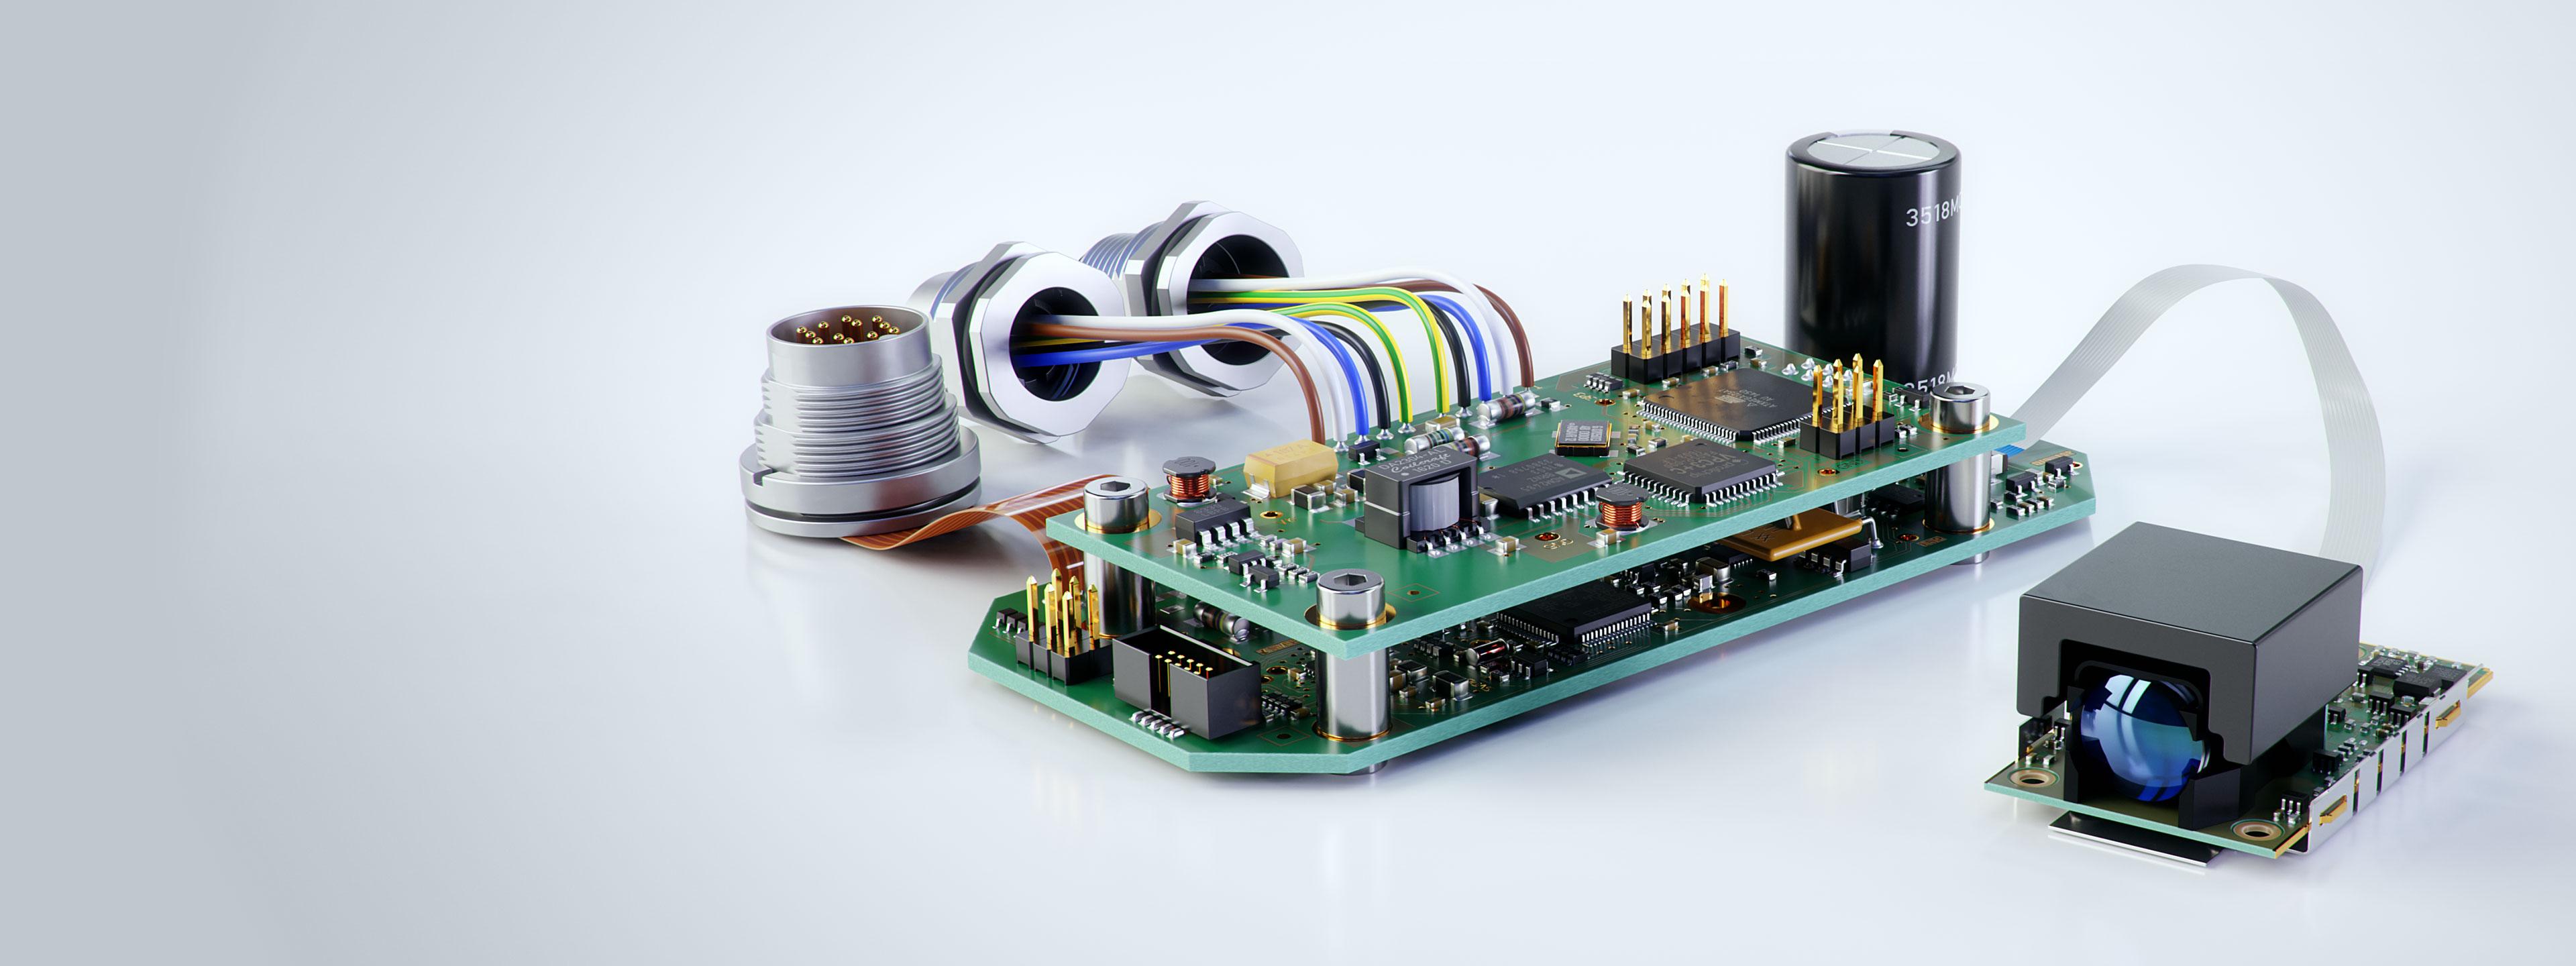 Laser-Distanzsensormodul / Laser Distance Sensor Module